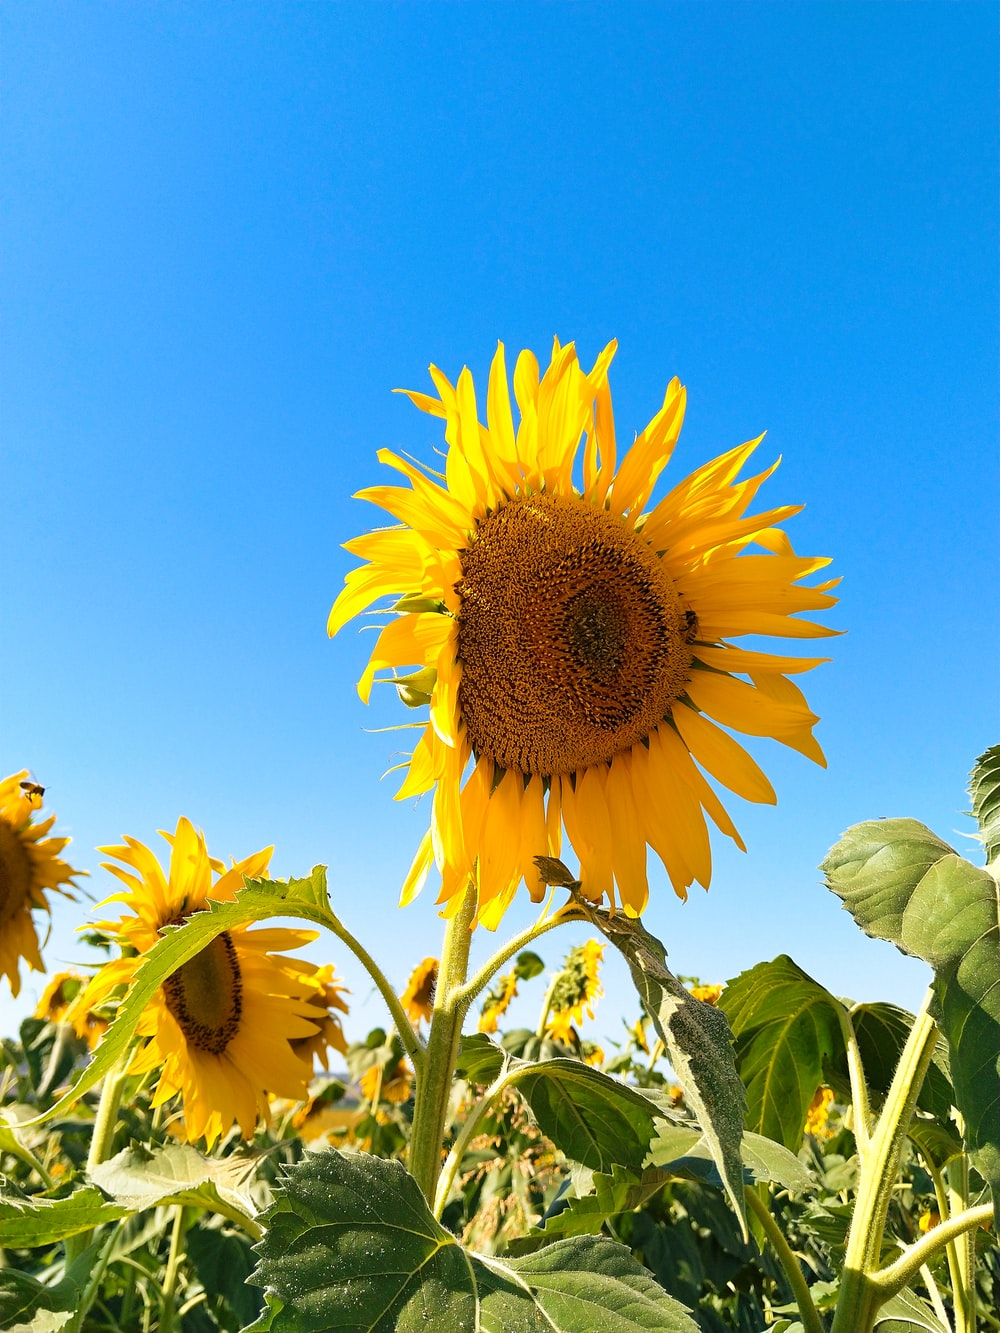 close up photo of Sunflowers